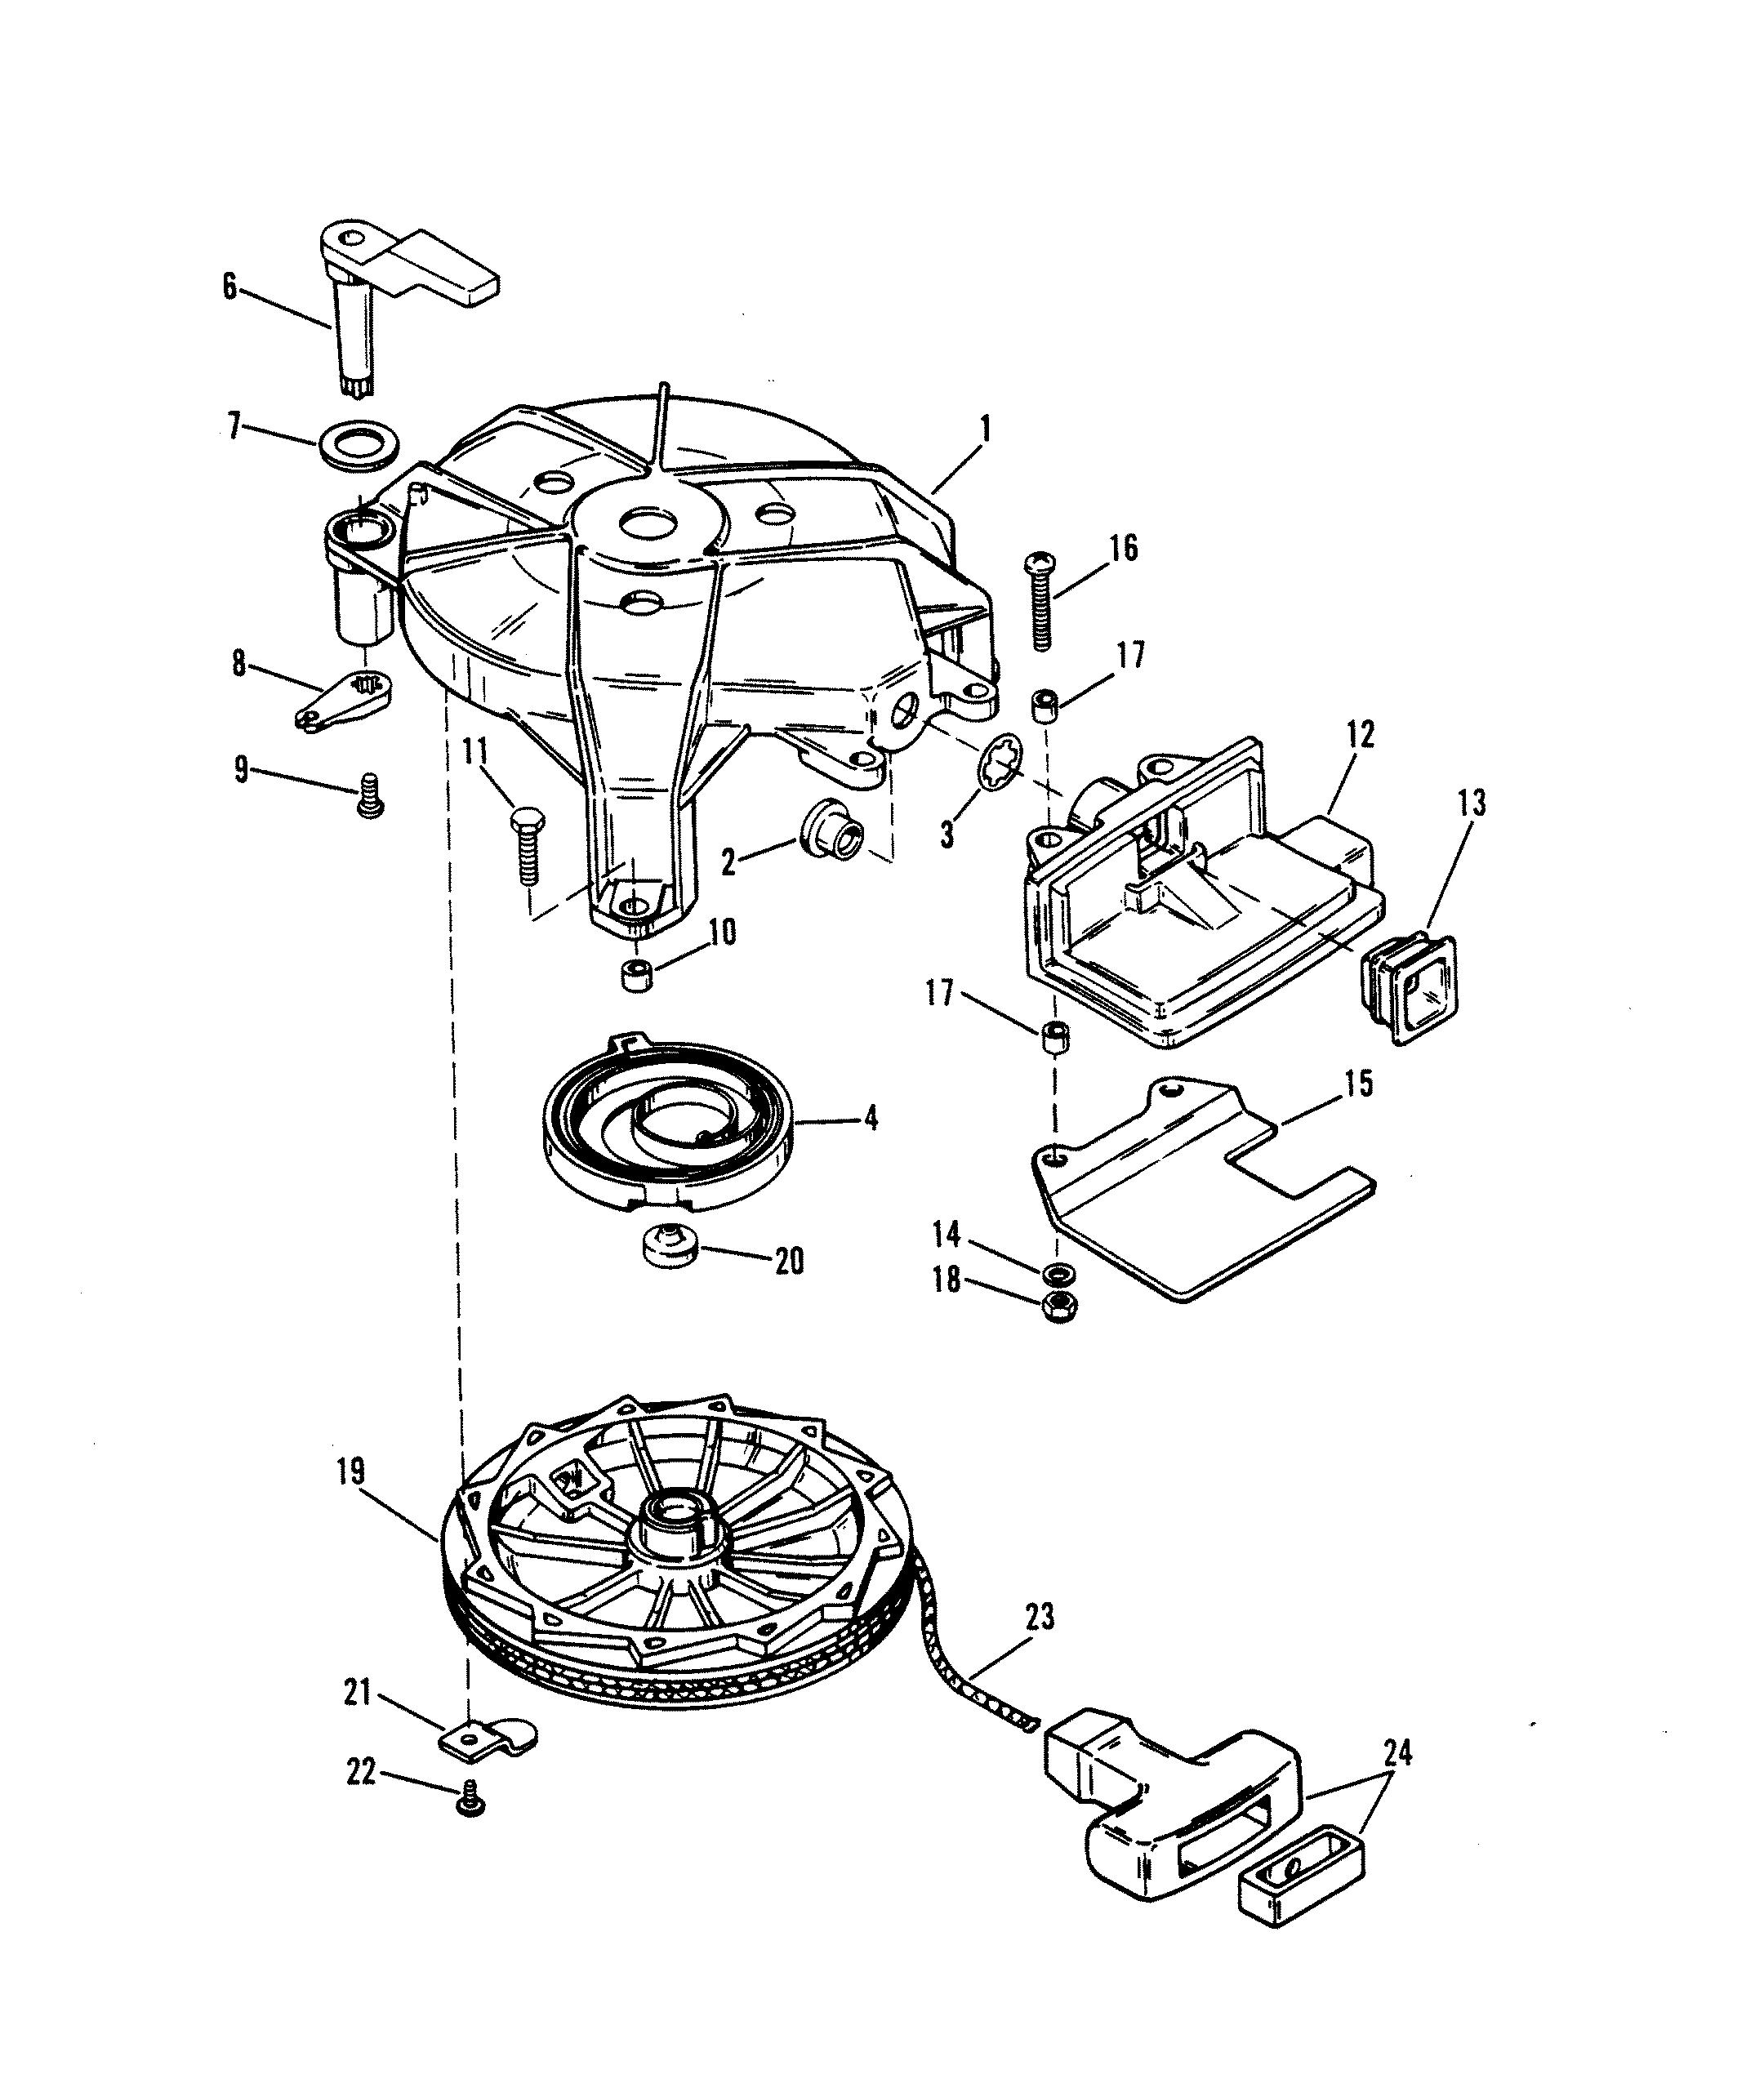 Manual Starter Design I For Mariner Mercury 6 8 Hp 9 9